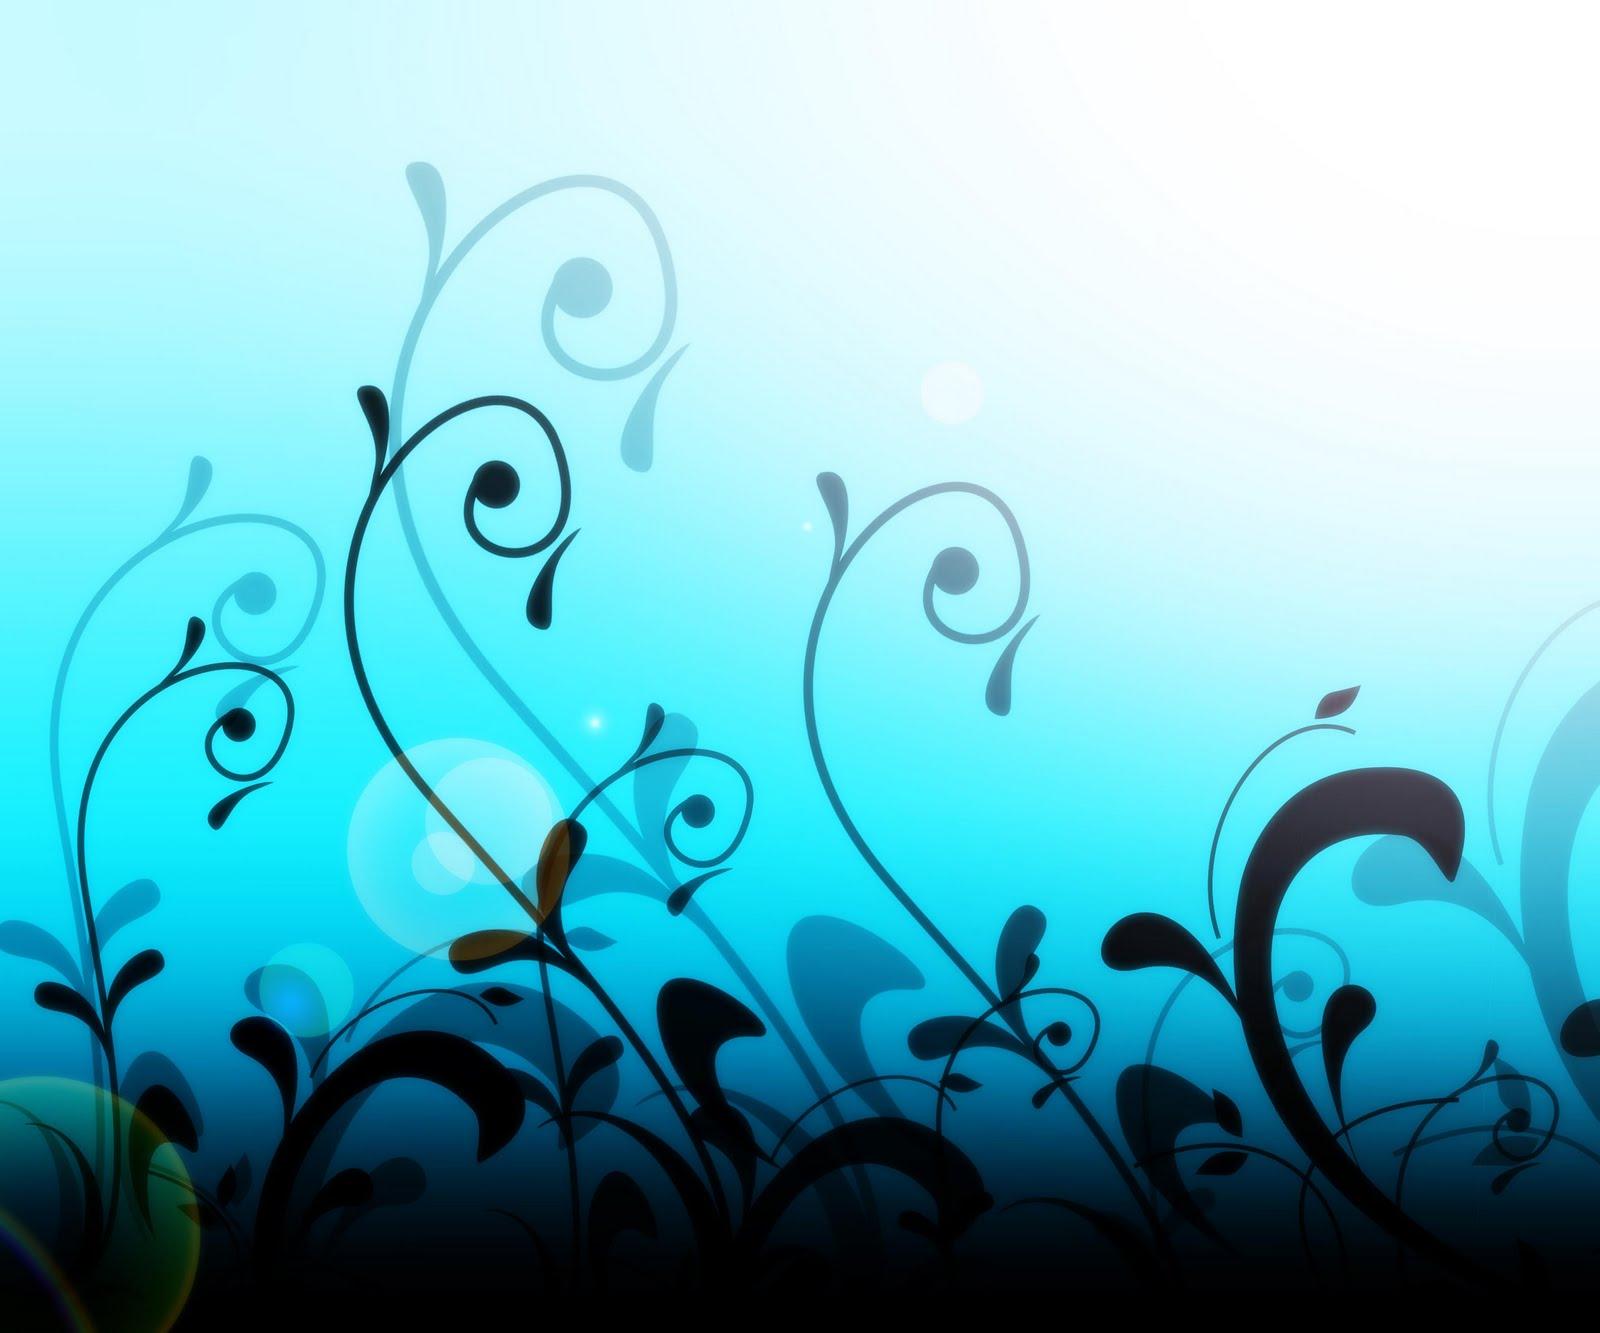 Image Image To Be A Lux Desain Spanduk Keren Picture Wallpaper ...